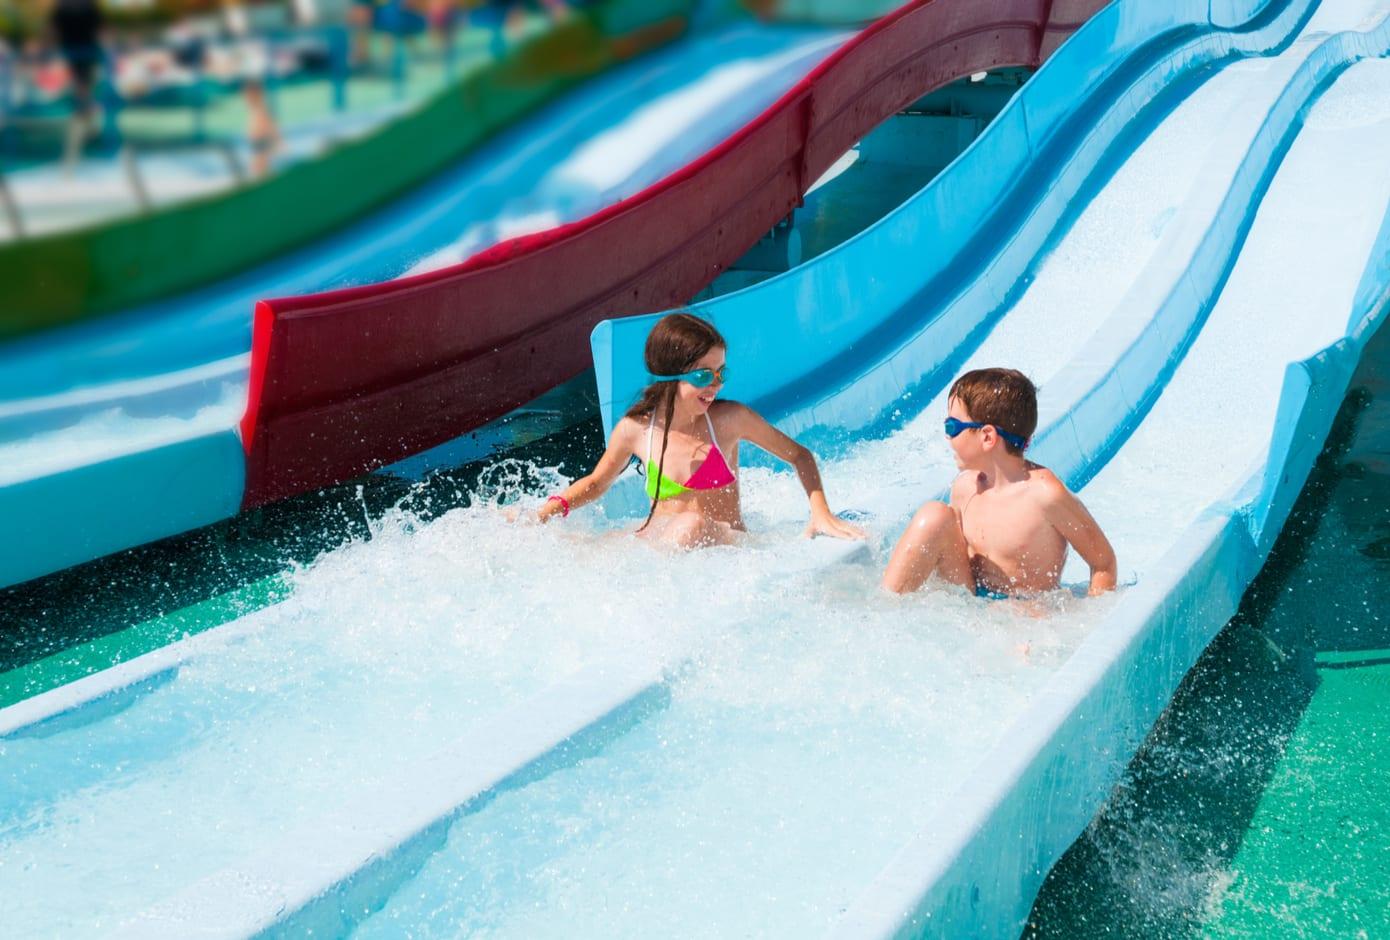 Two kids having fun at a water slide.